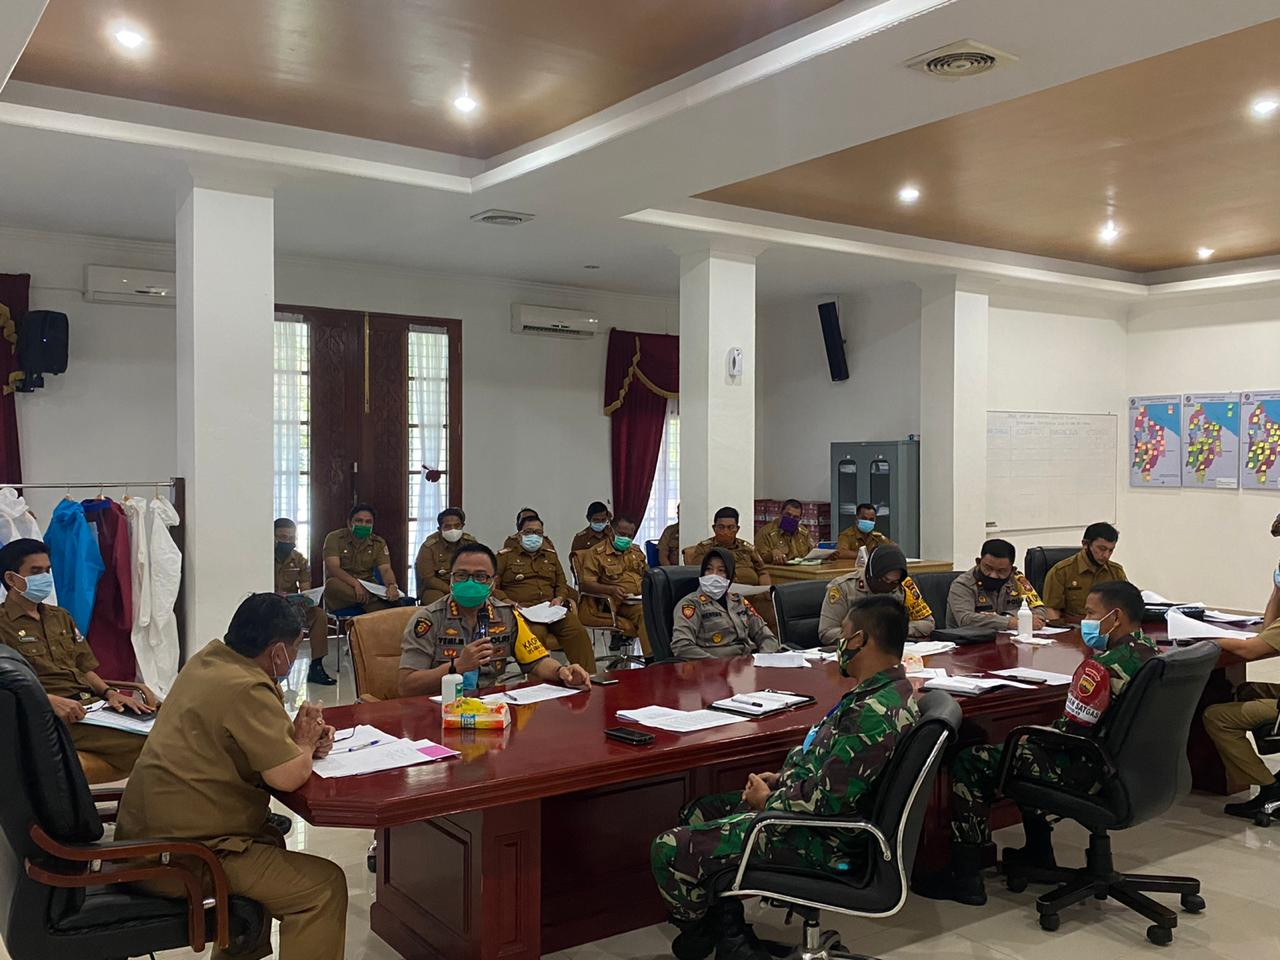 Kapolresta Deli Serdang, Hadiri Rapat Koordinasi Penyaluran Bansos Pemkab Deli Serdang